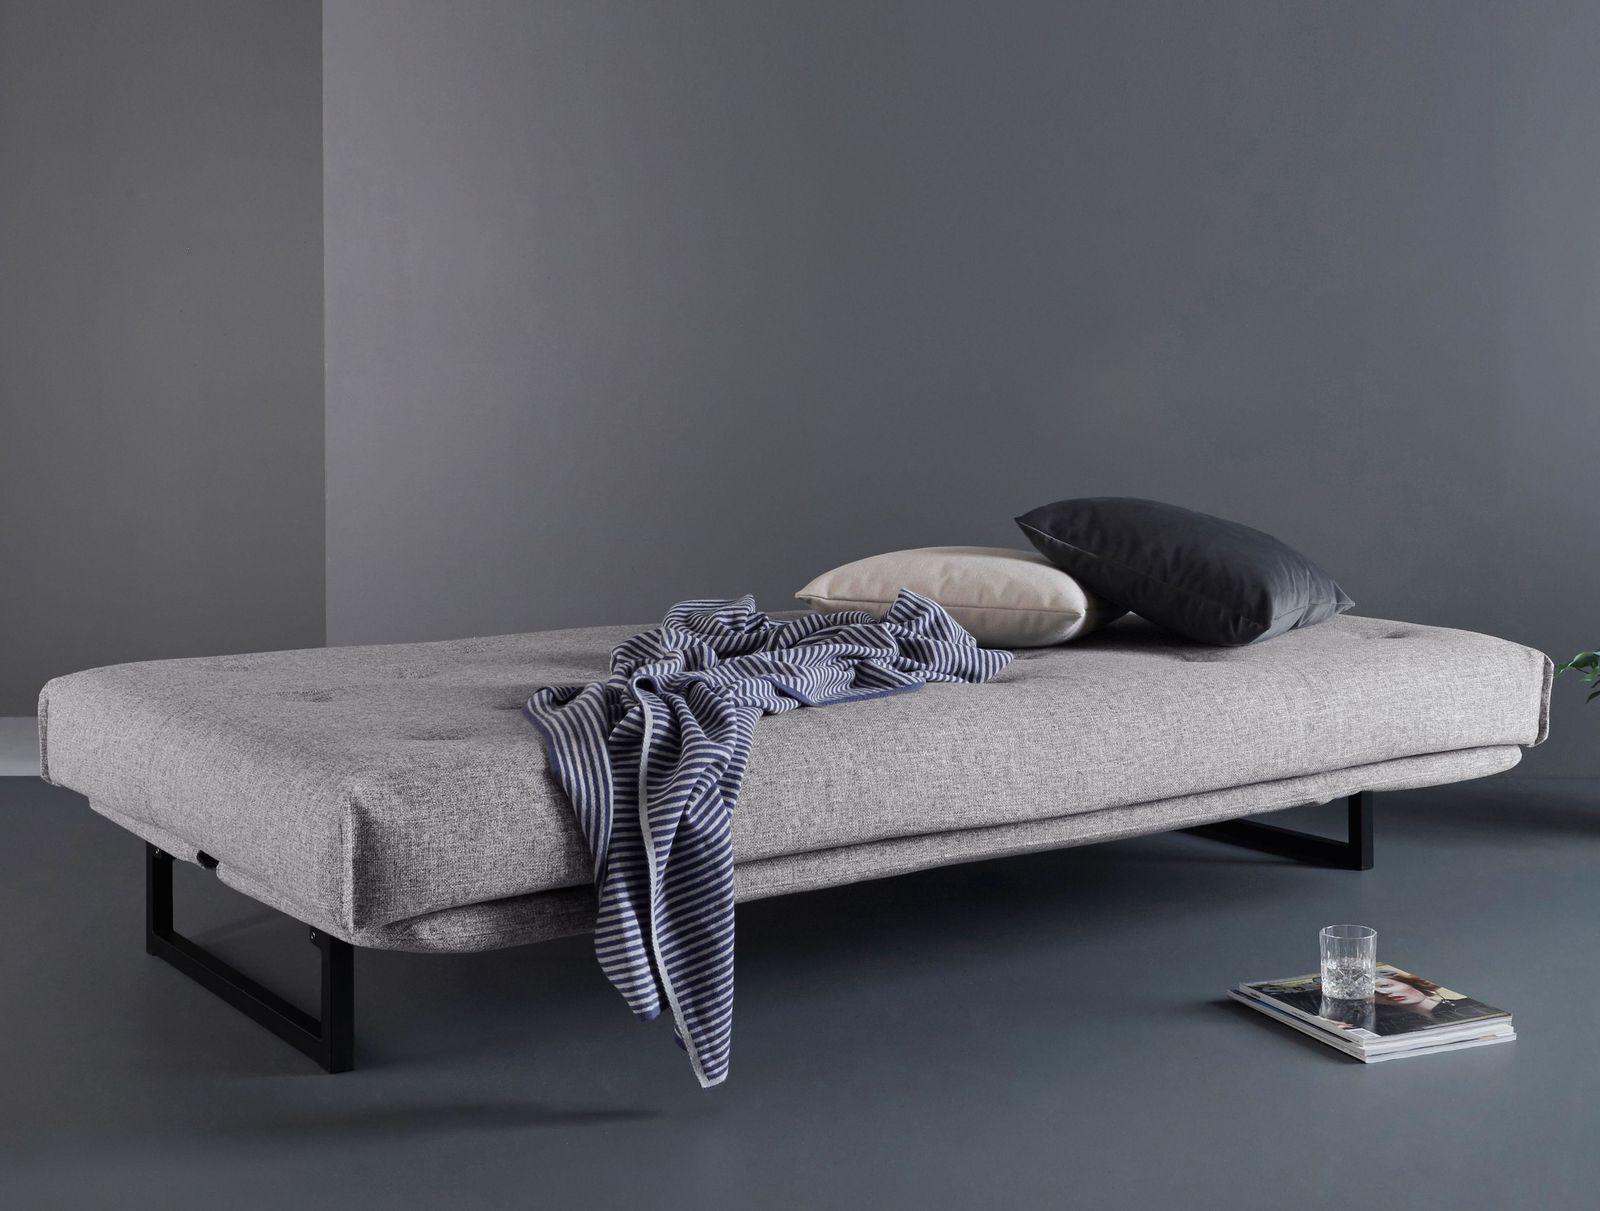 designer schlafsofa f r jede nacht schwarzes gestell frentano. Black Bedroom Furniture Sets. Home Design Ideas